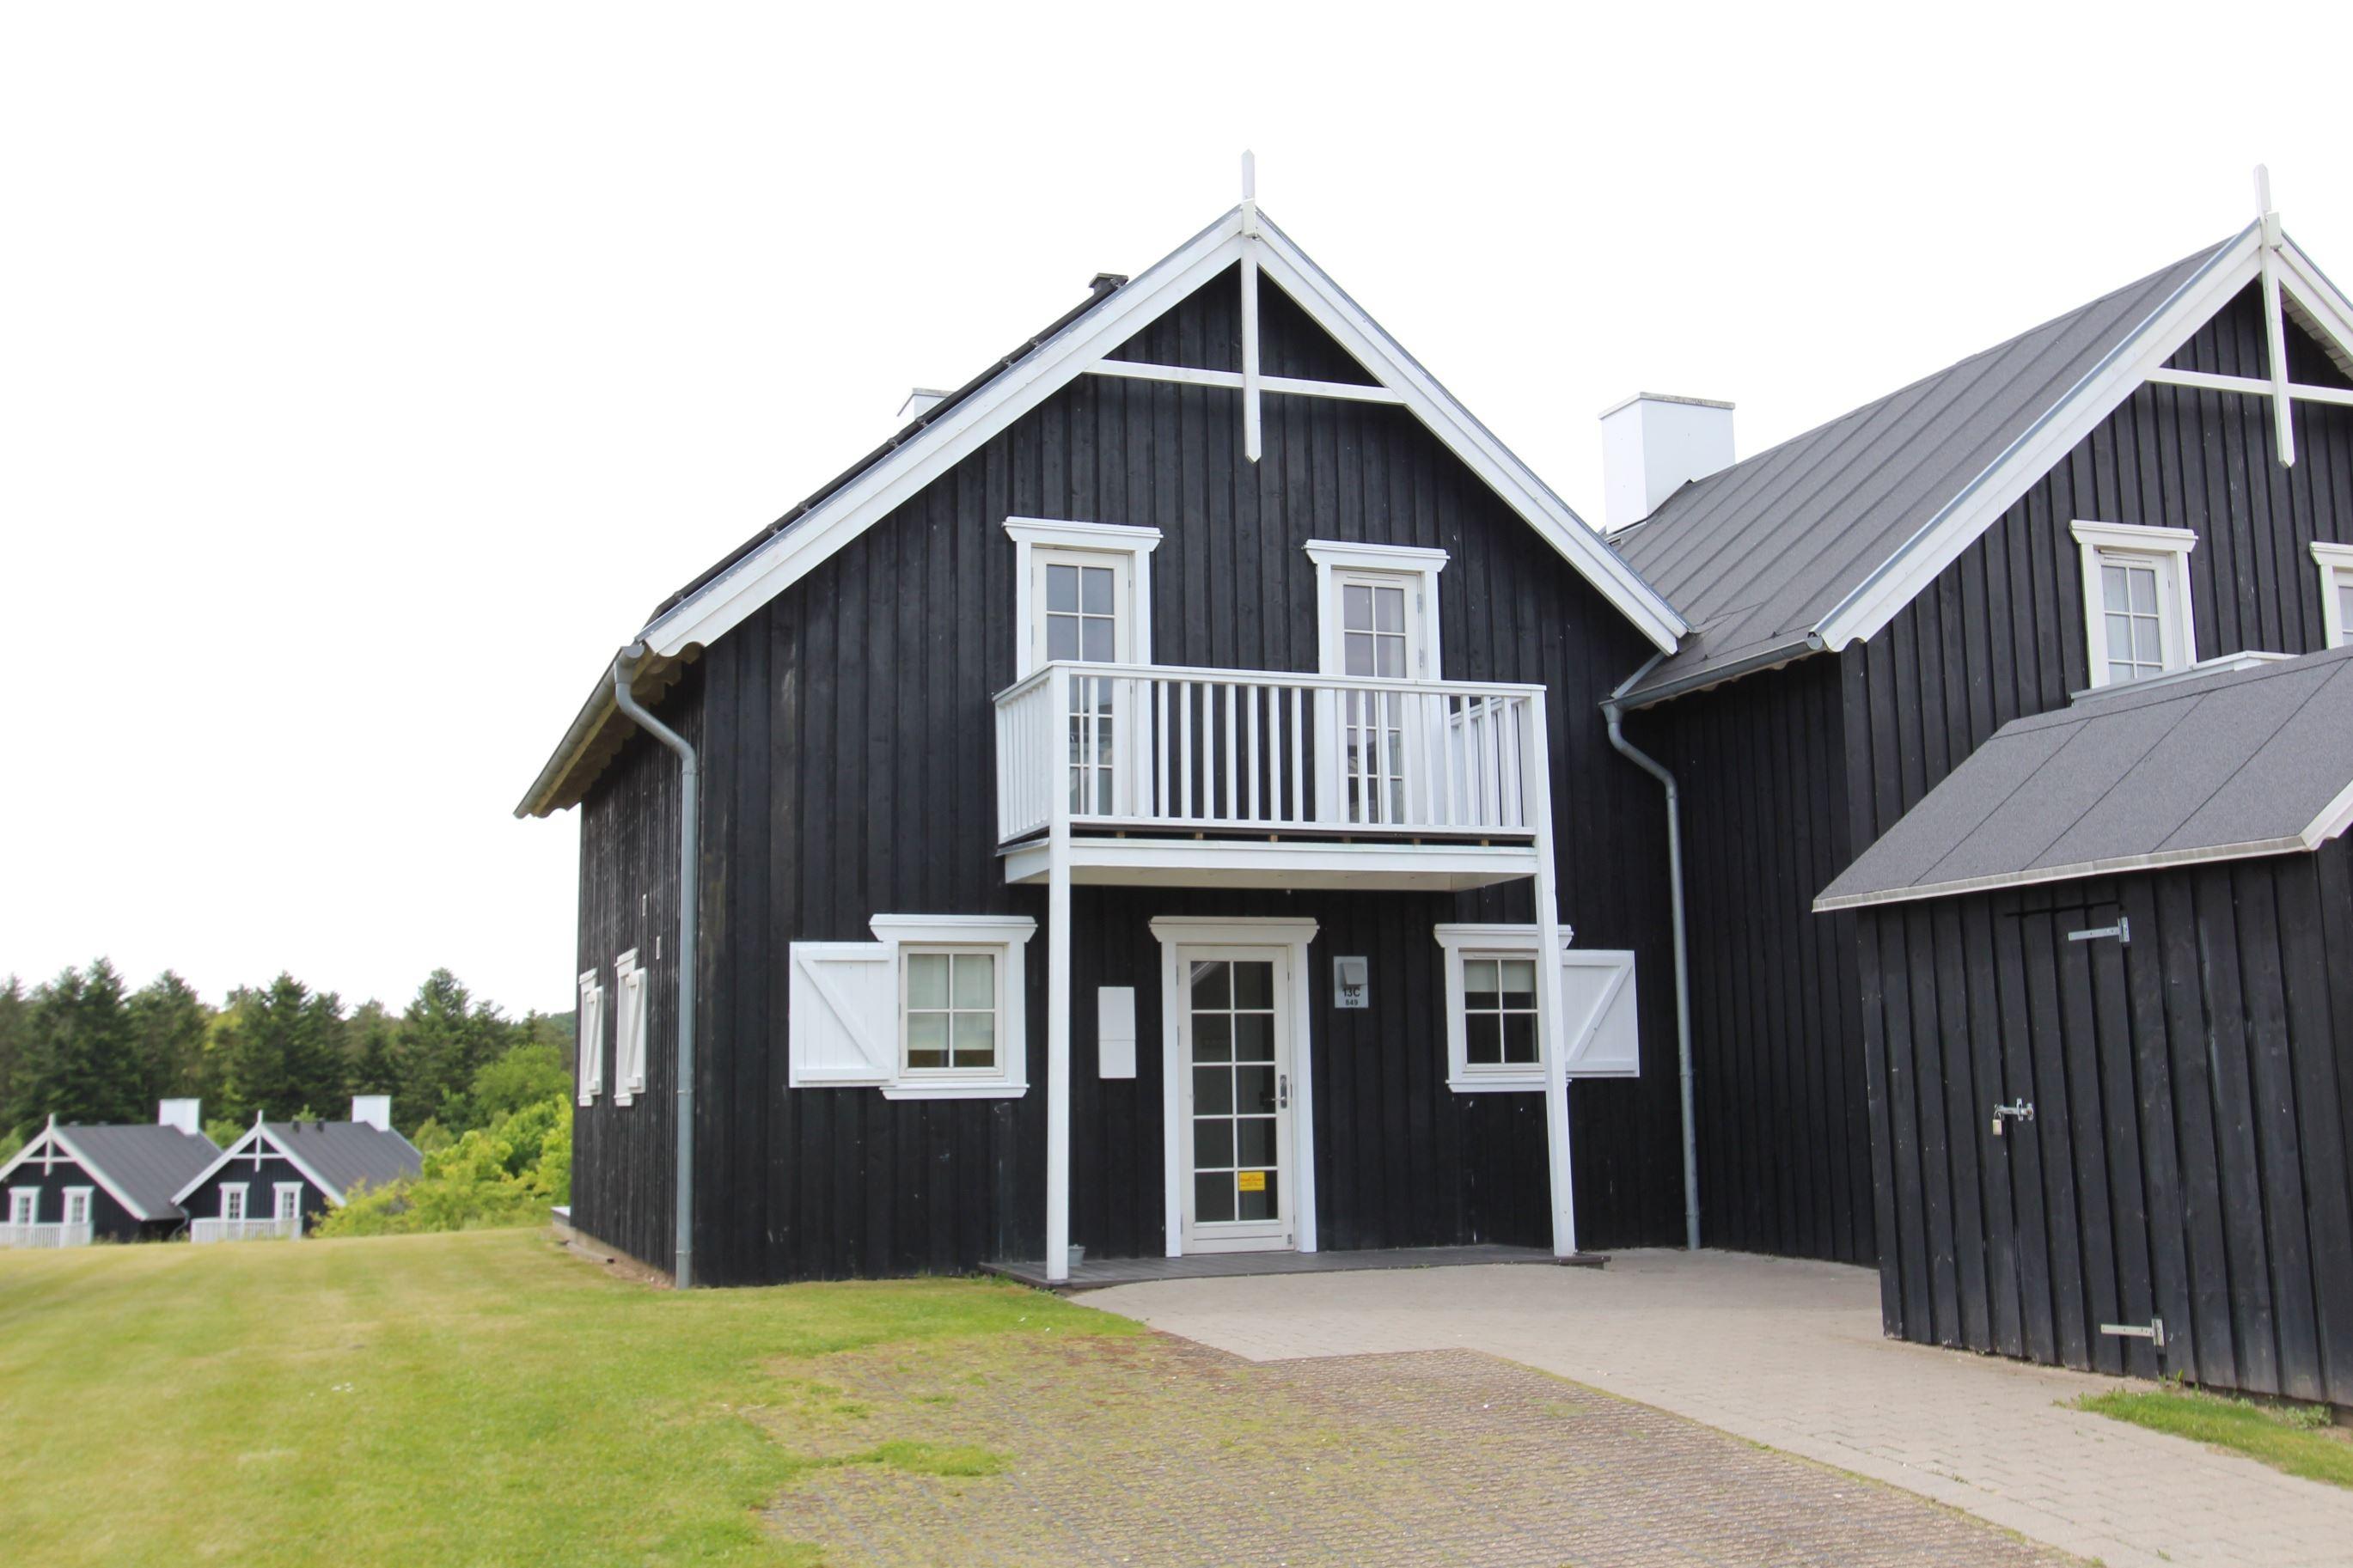 Troldbjergvej 13C, 8883 Gjern